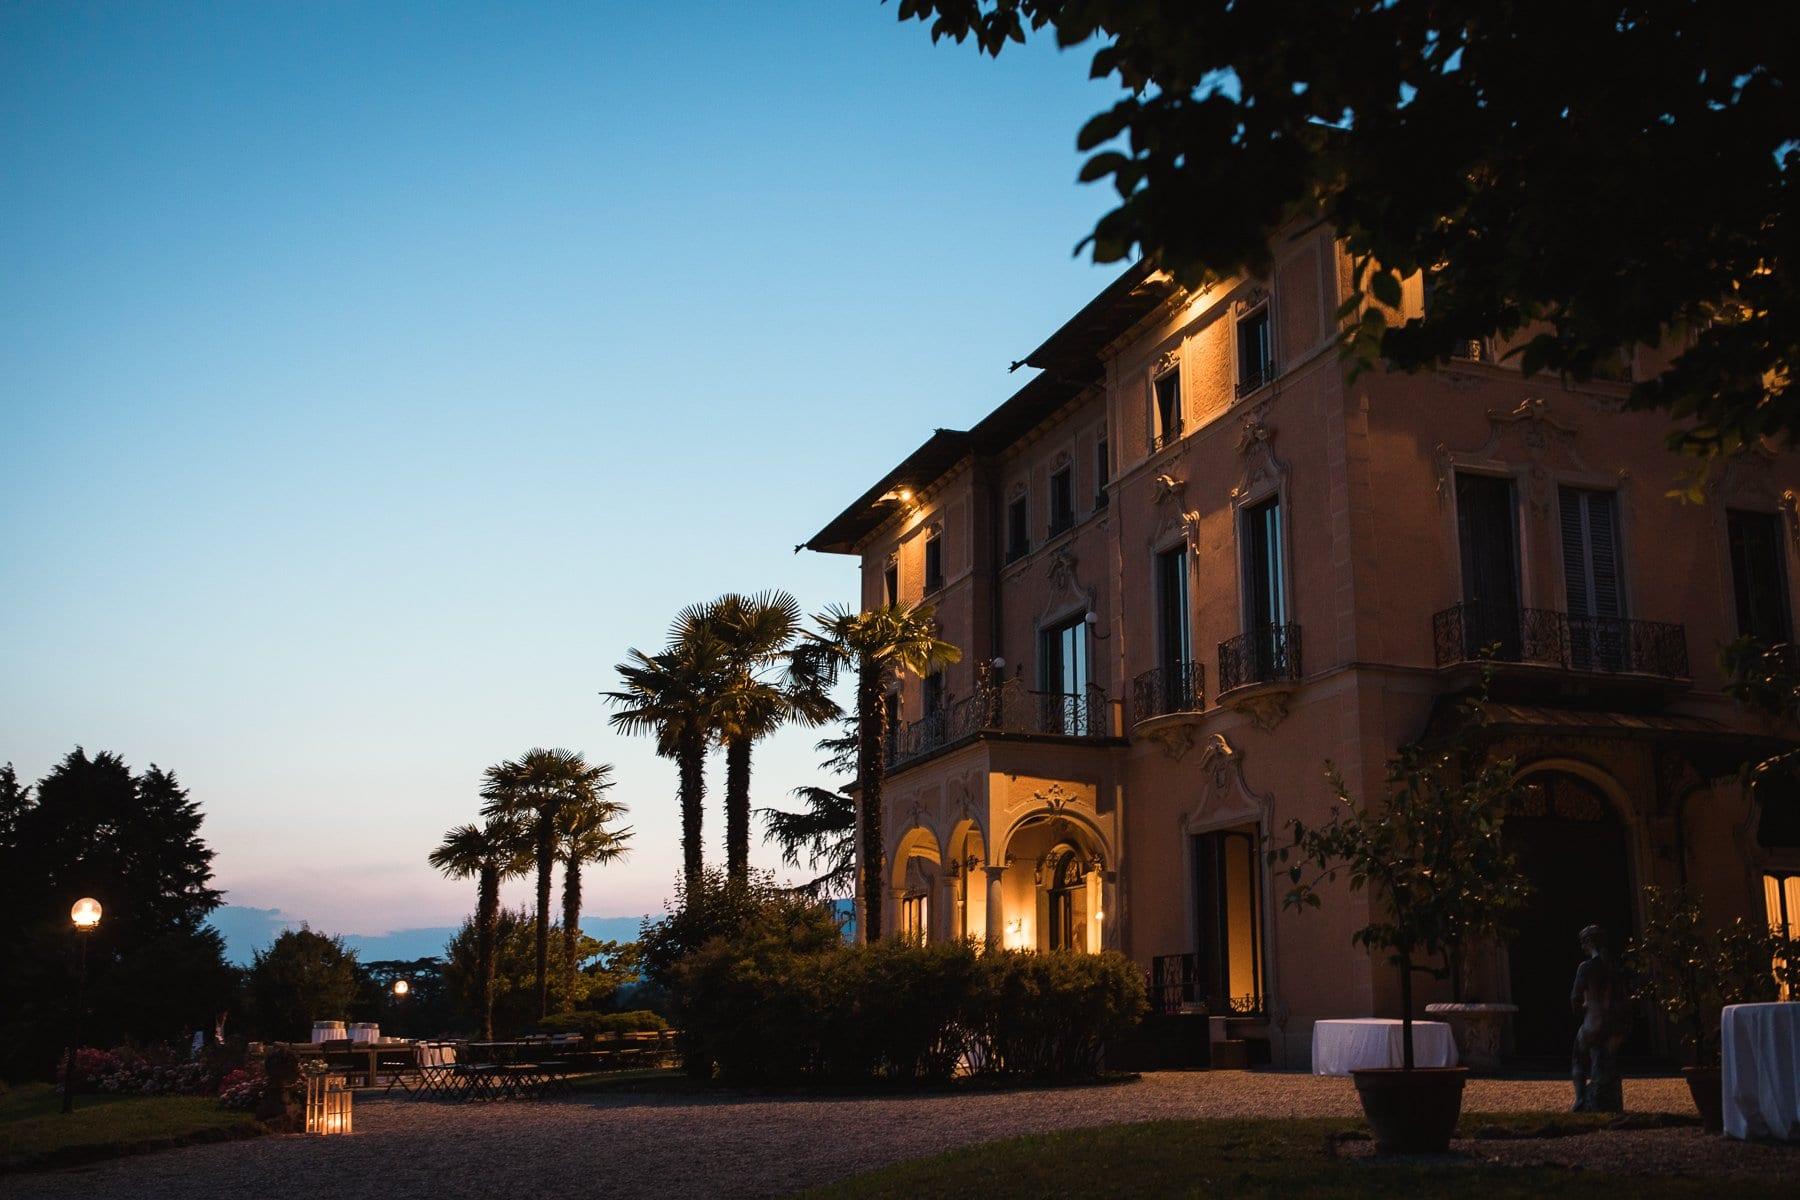 Matrimonio Villa Montalbano Varese - Fotografo matrimonio Varese